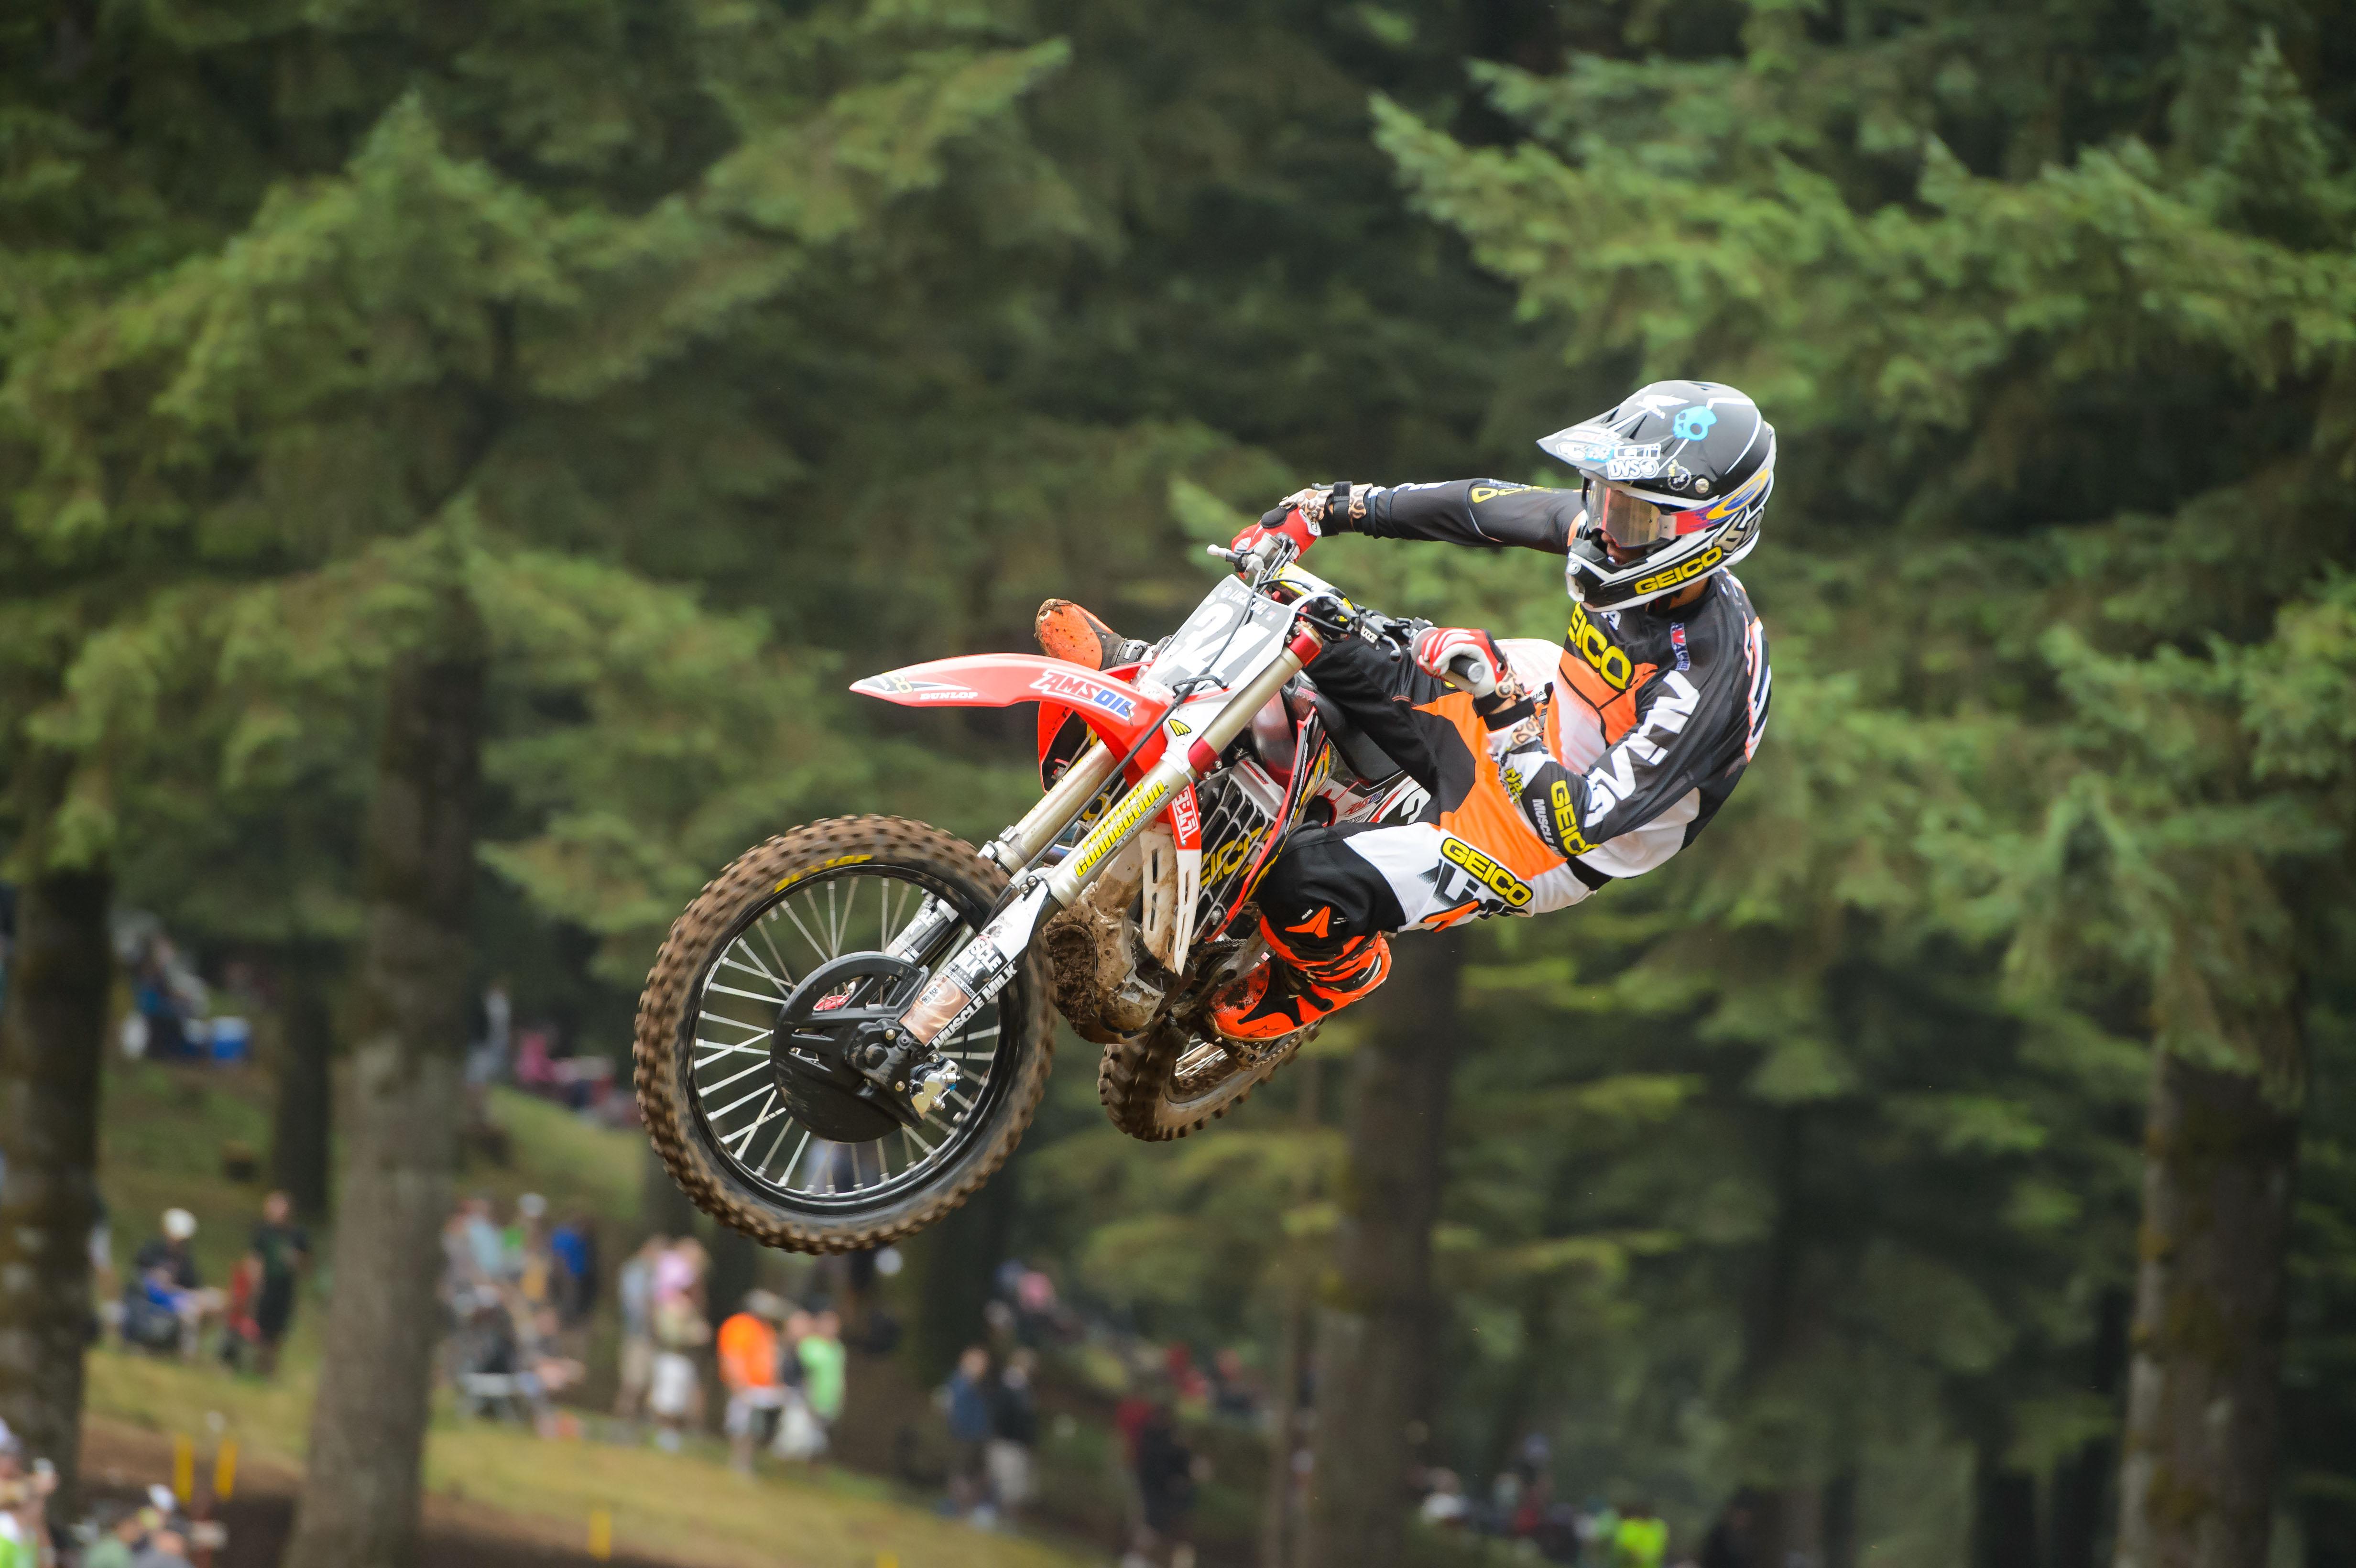 dirtbike moto motocross race racing motorbike honda e wallpaper